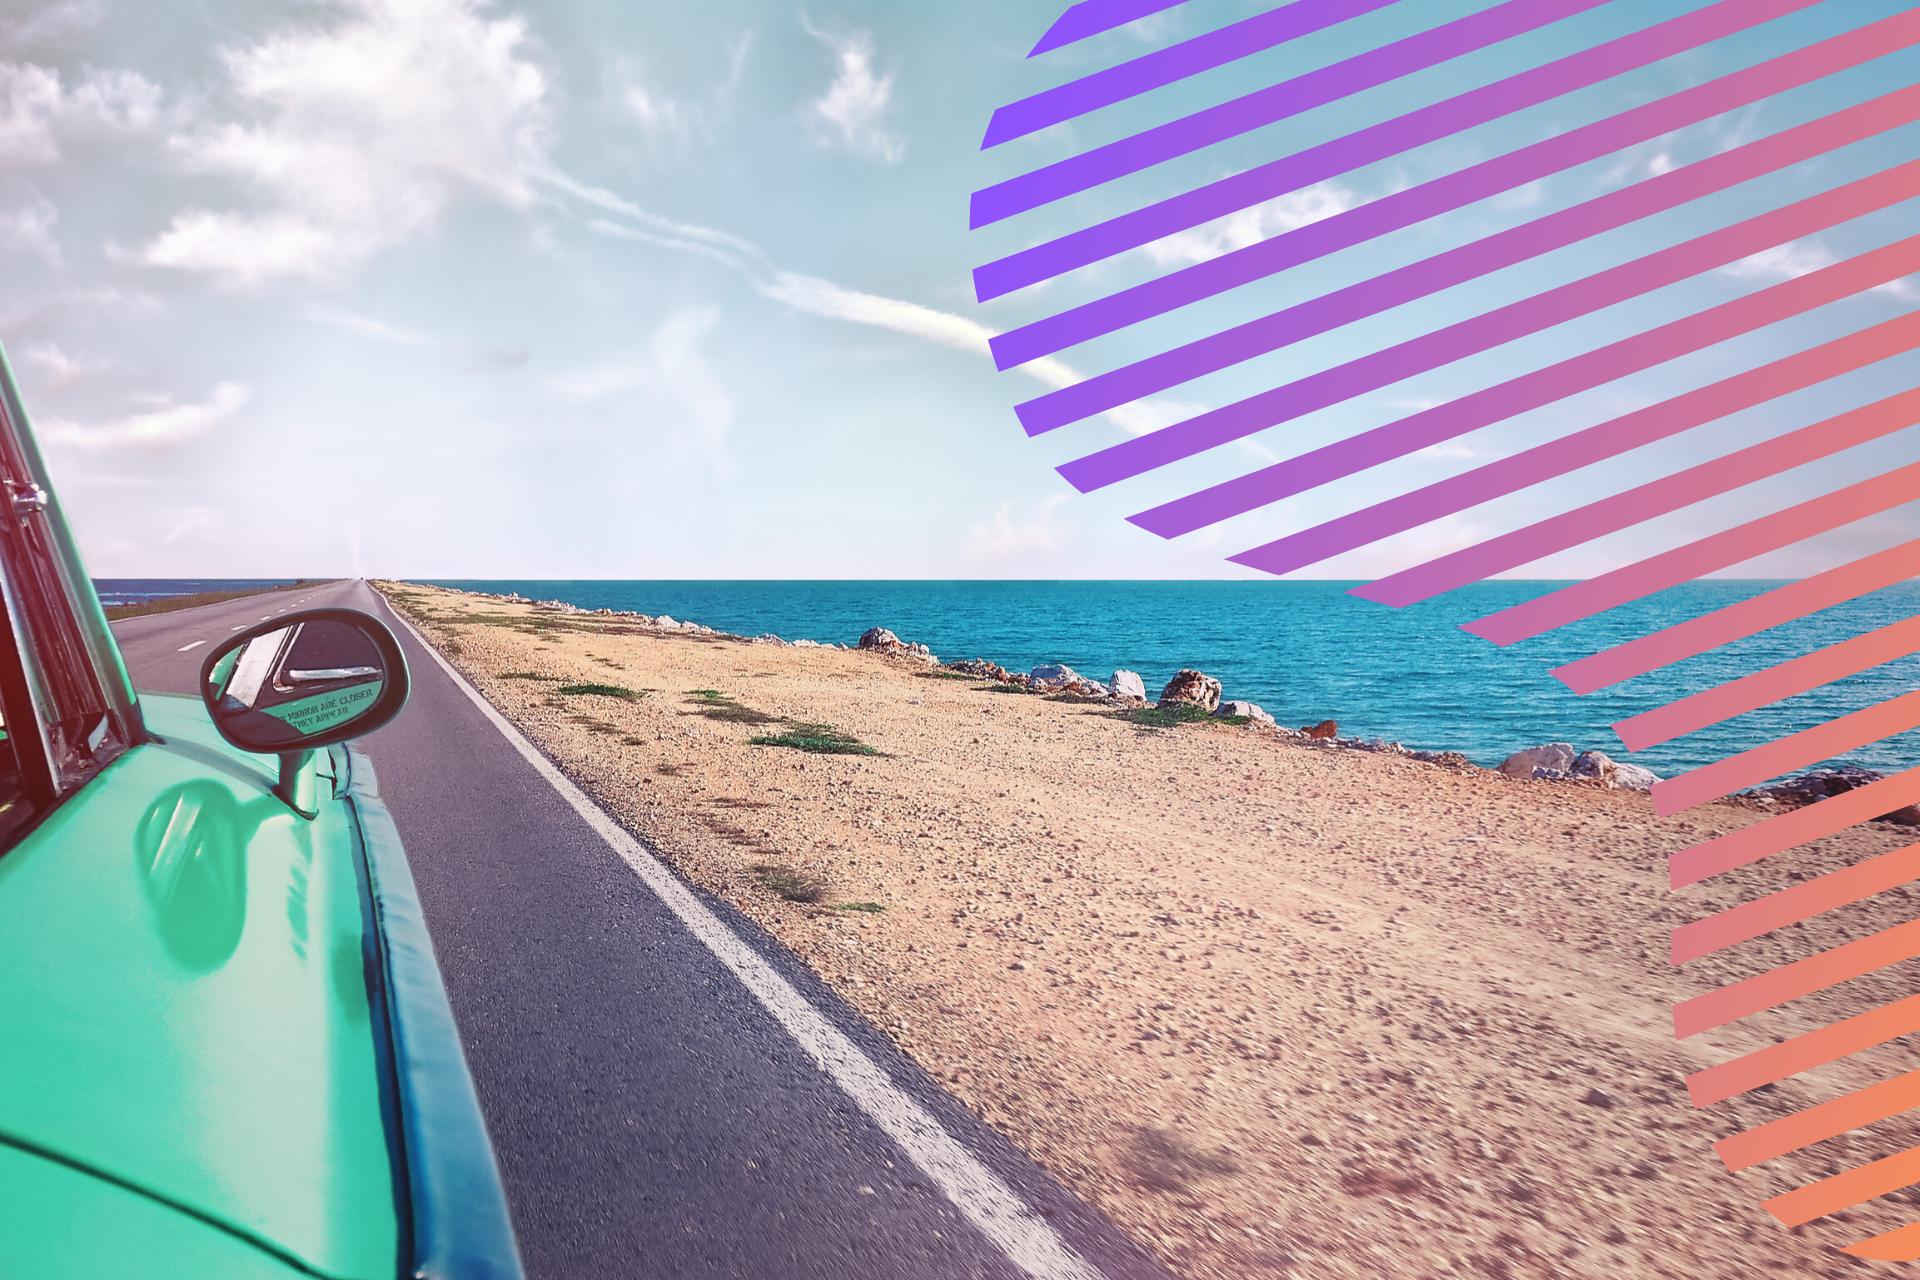 Automotive: A customers journey starts online